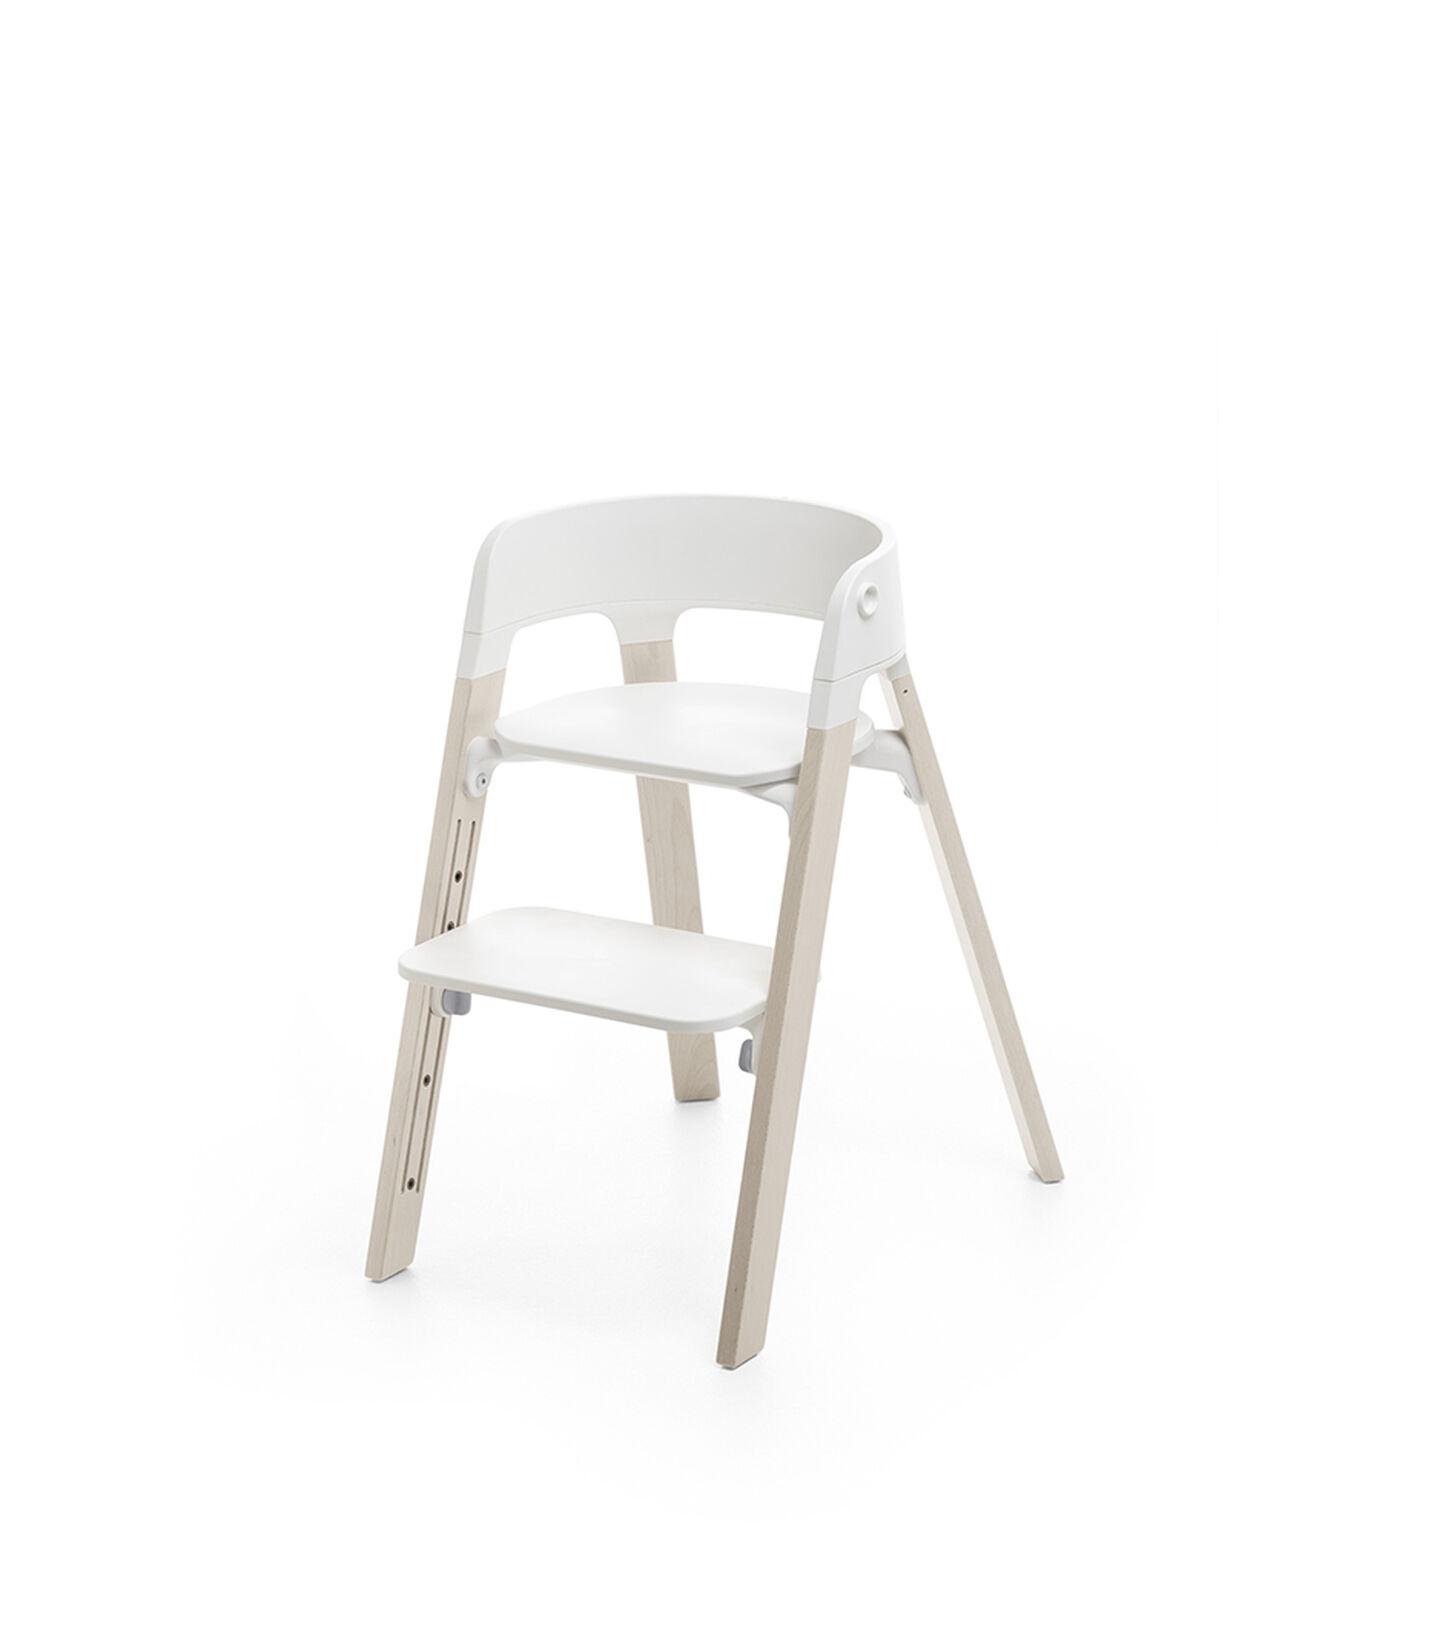 Stokke® Steps™ Chair Whitewash Legs with White, Whitewash, mainview view 1